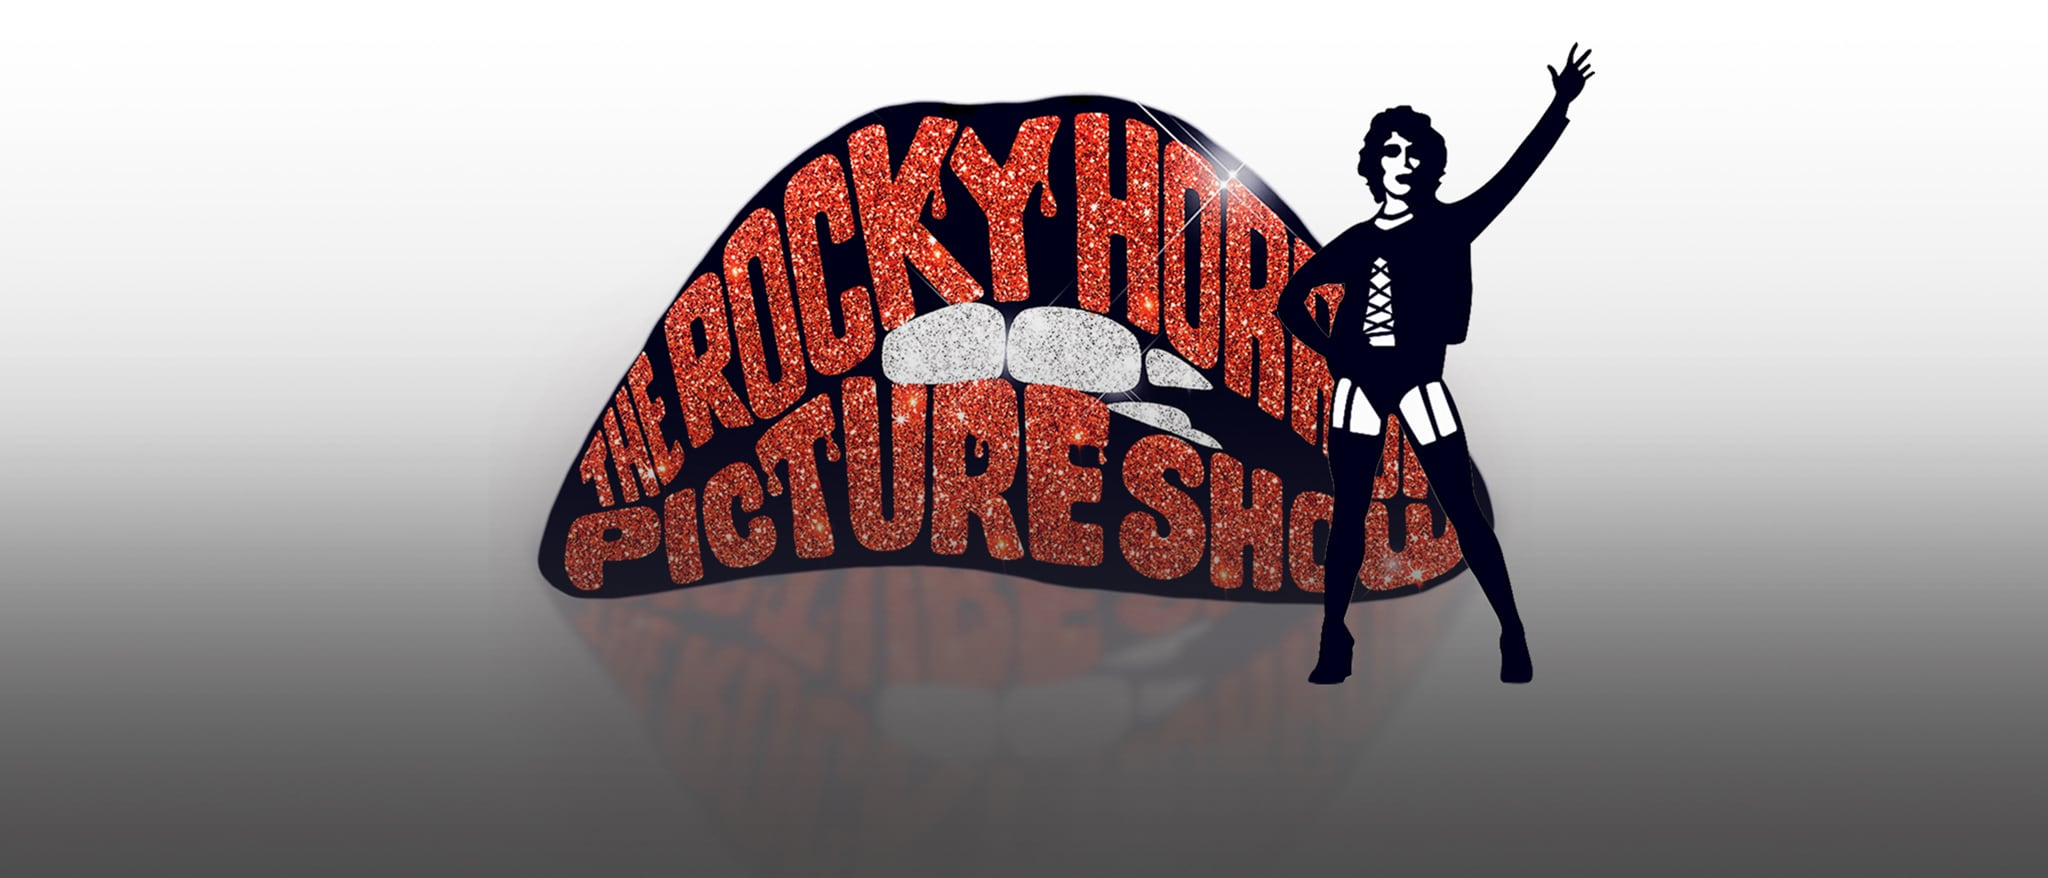 Homepage Hero - The Rocky Horror Picture Show (45th Anniversary) Hero